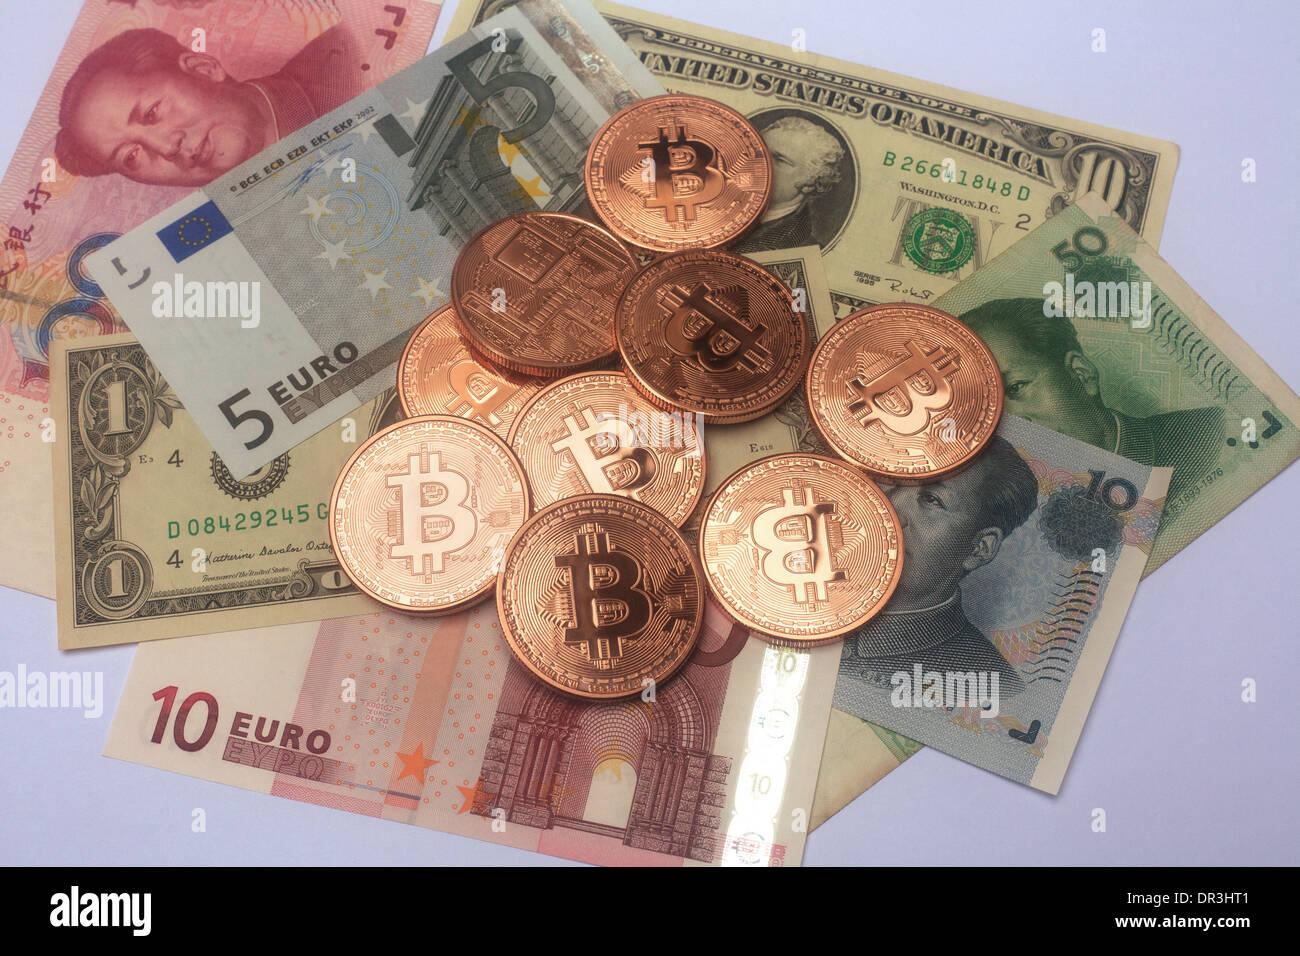 Bitcoin 10000 usd in euro